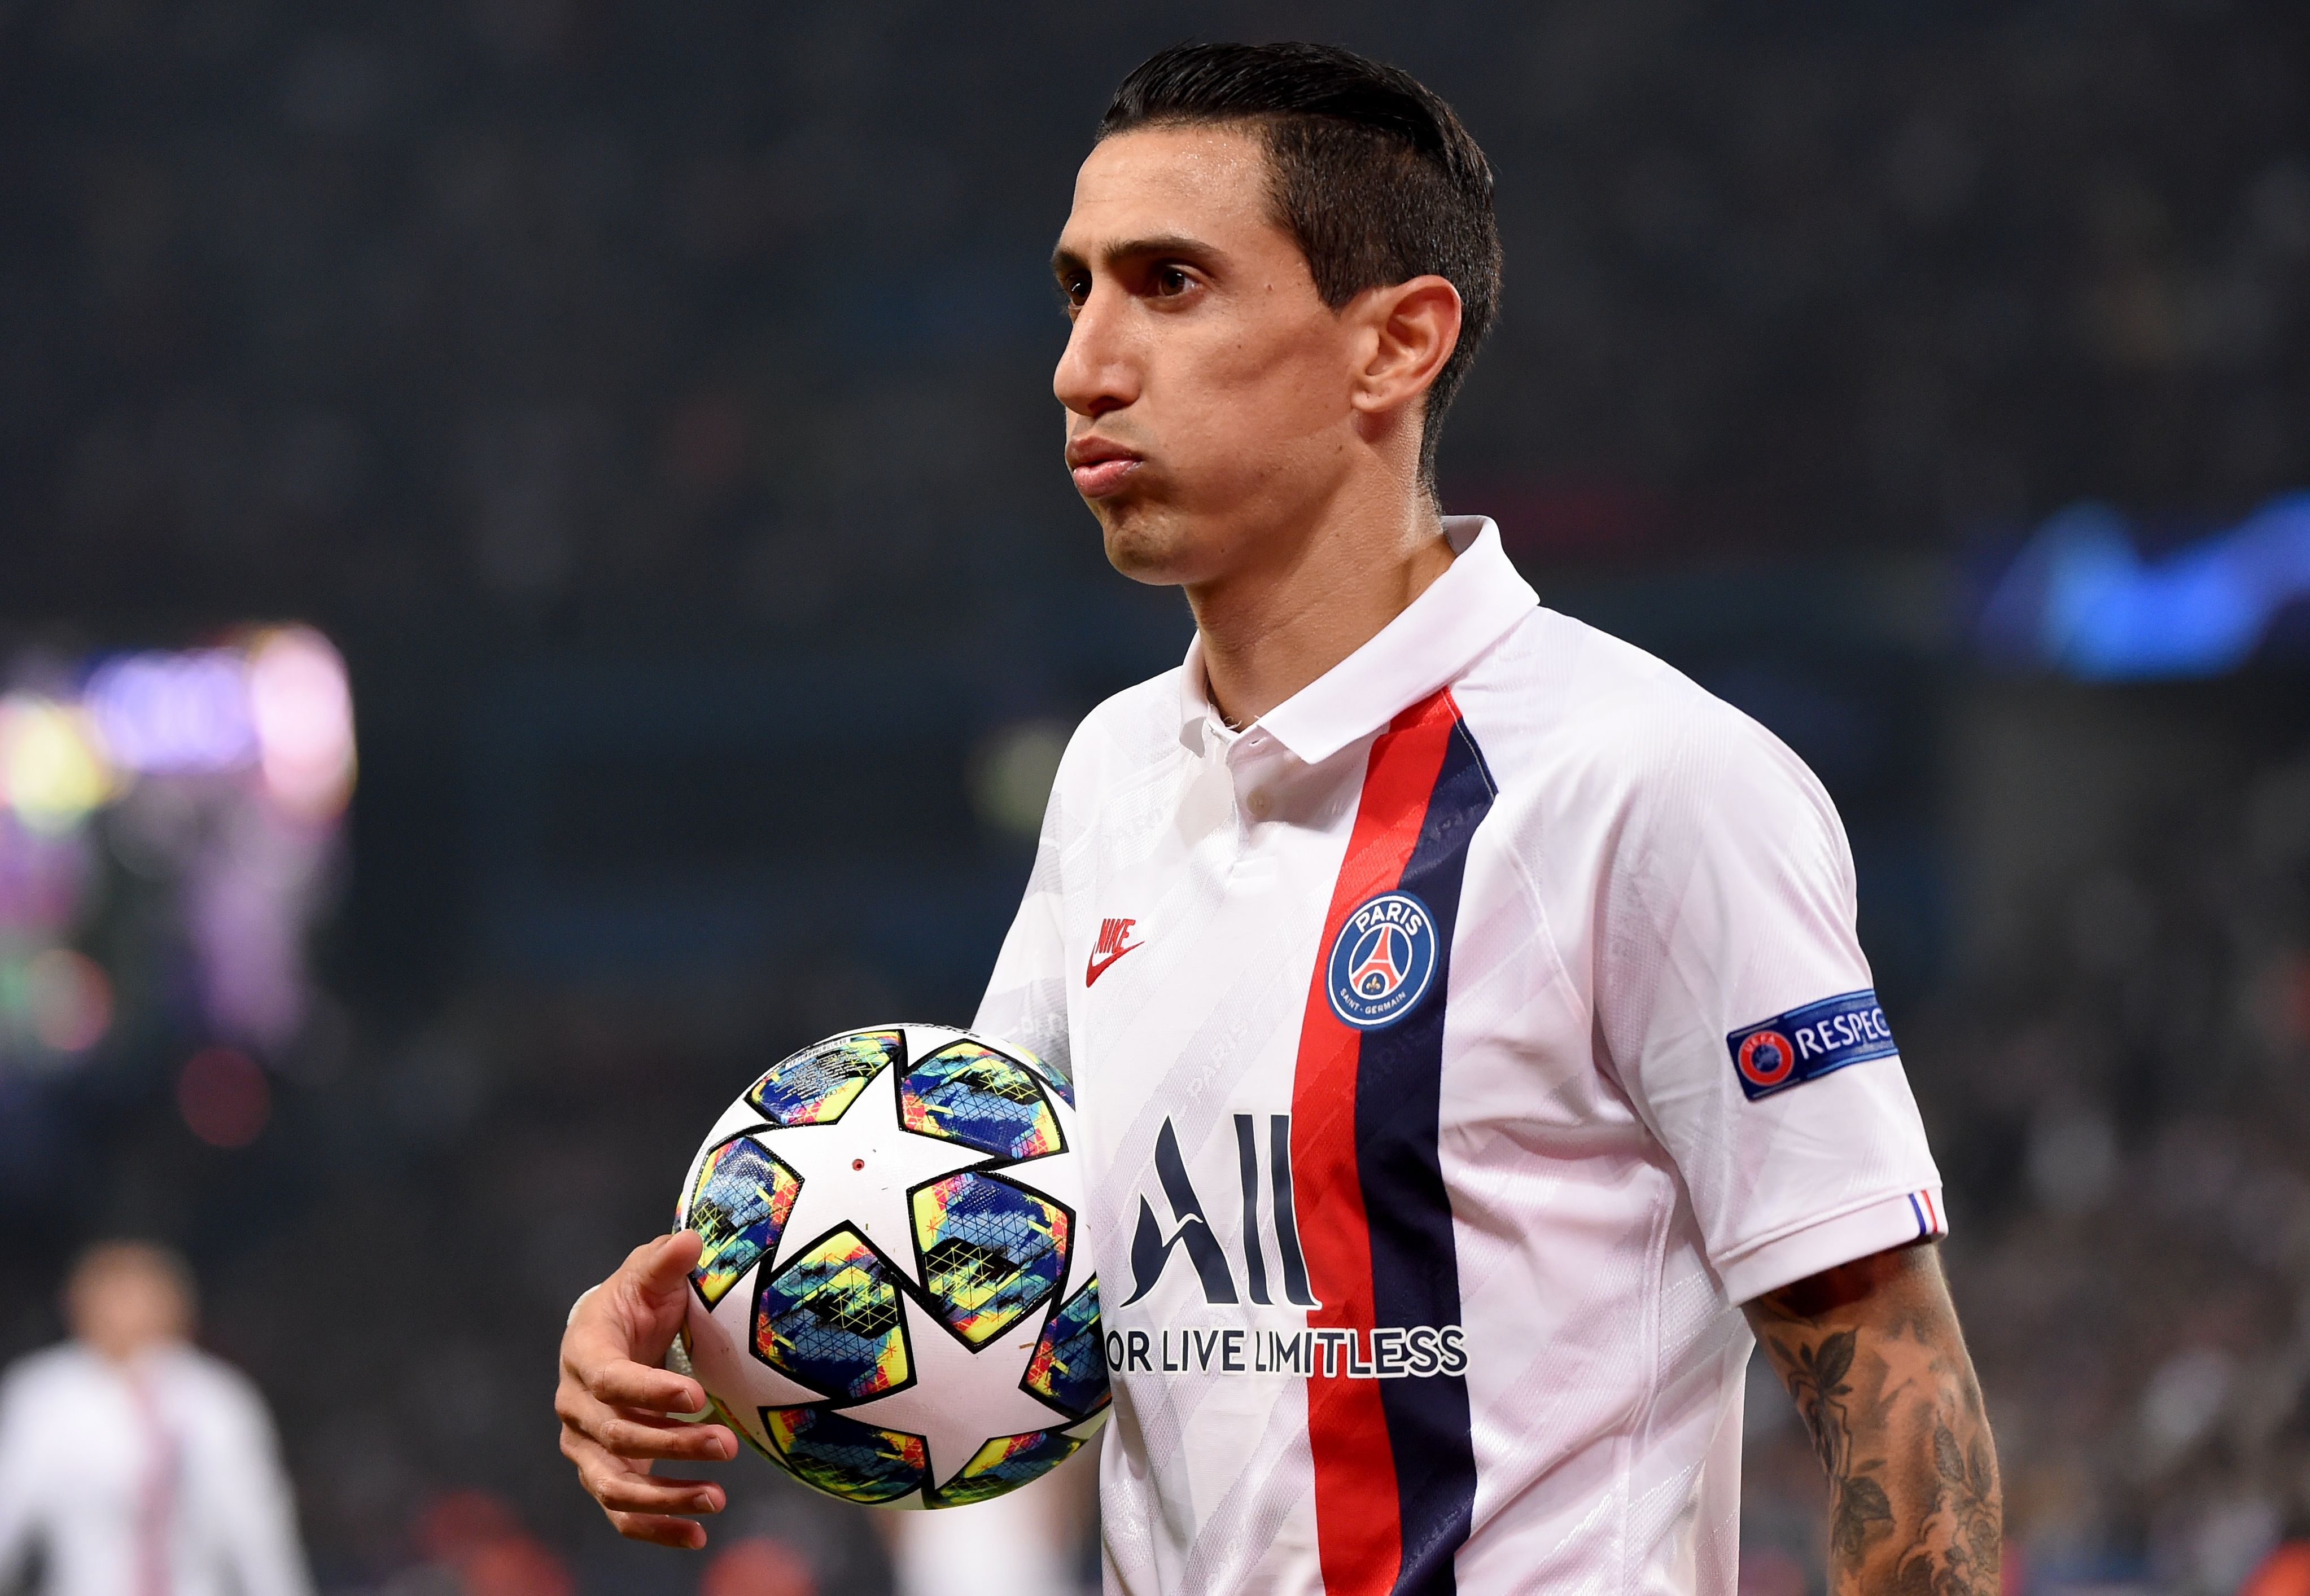 https www cnn com europe live news champions league live blog psg real madrid atletico juve spt intl h 1d77b90f7ce40cdfa4172571cf7d1d55